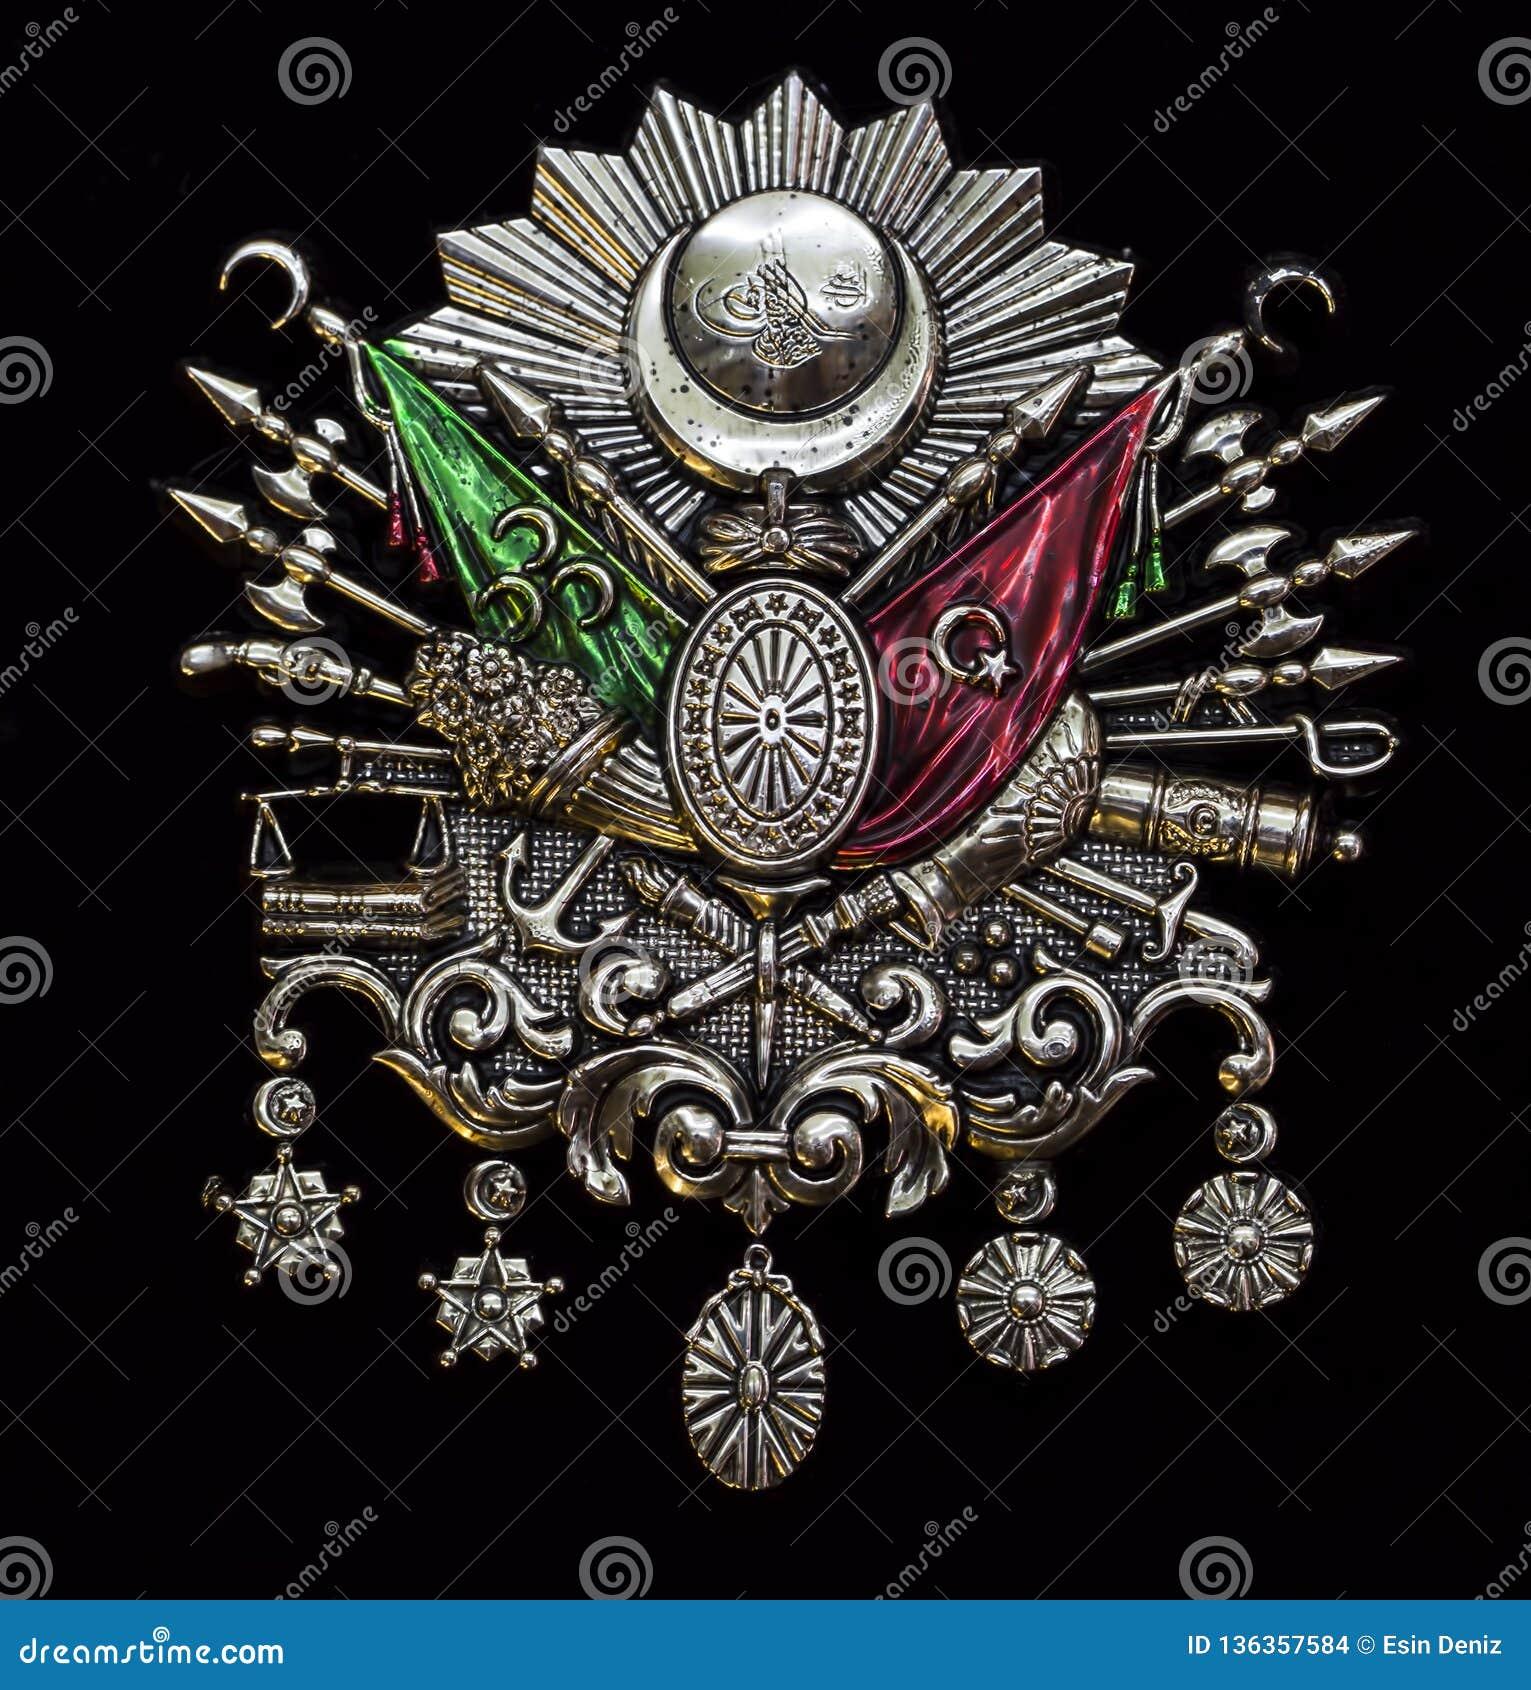 Großer Osmanli Tugra Deko Sticker Türkei Türkiye Osmanischer Reich Wappen 7cm